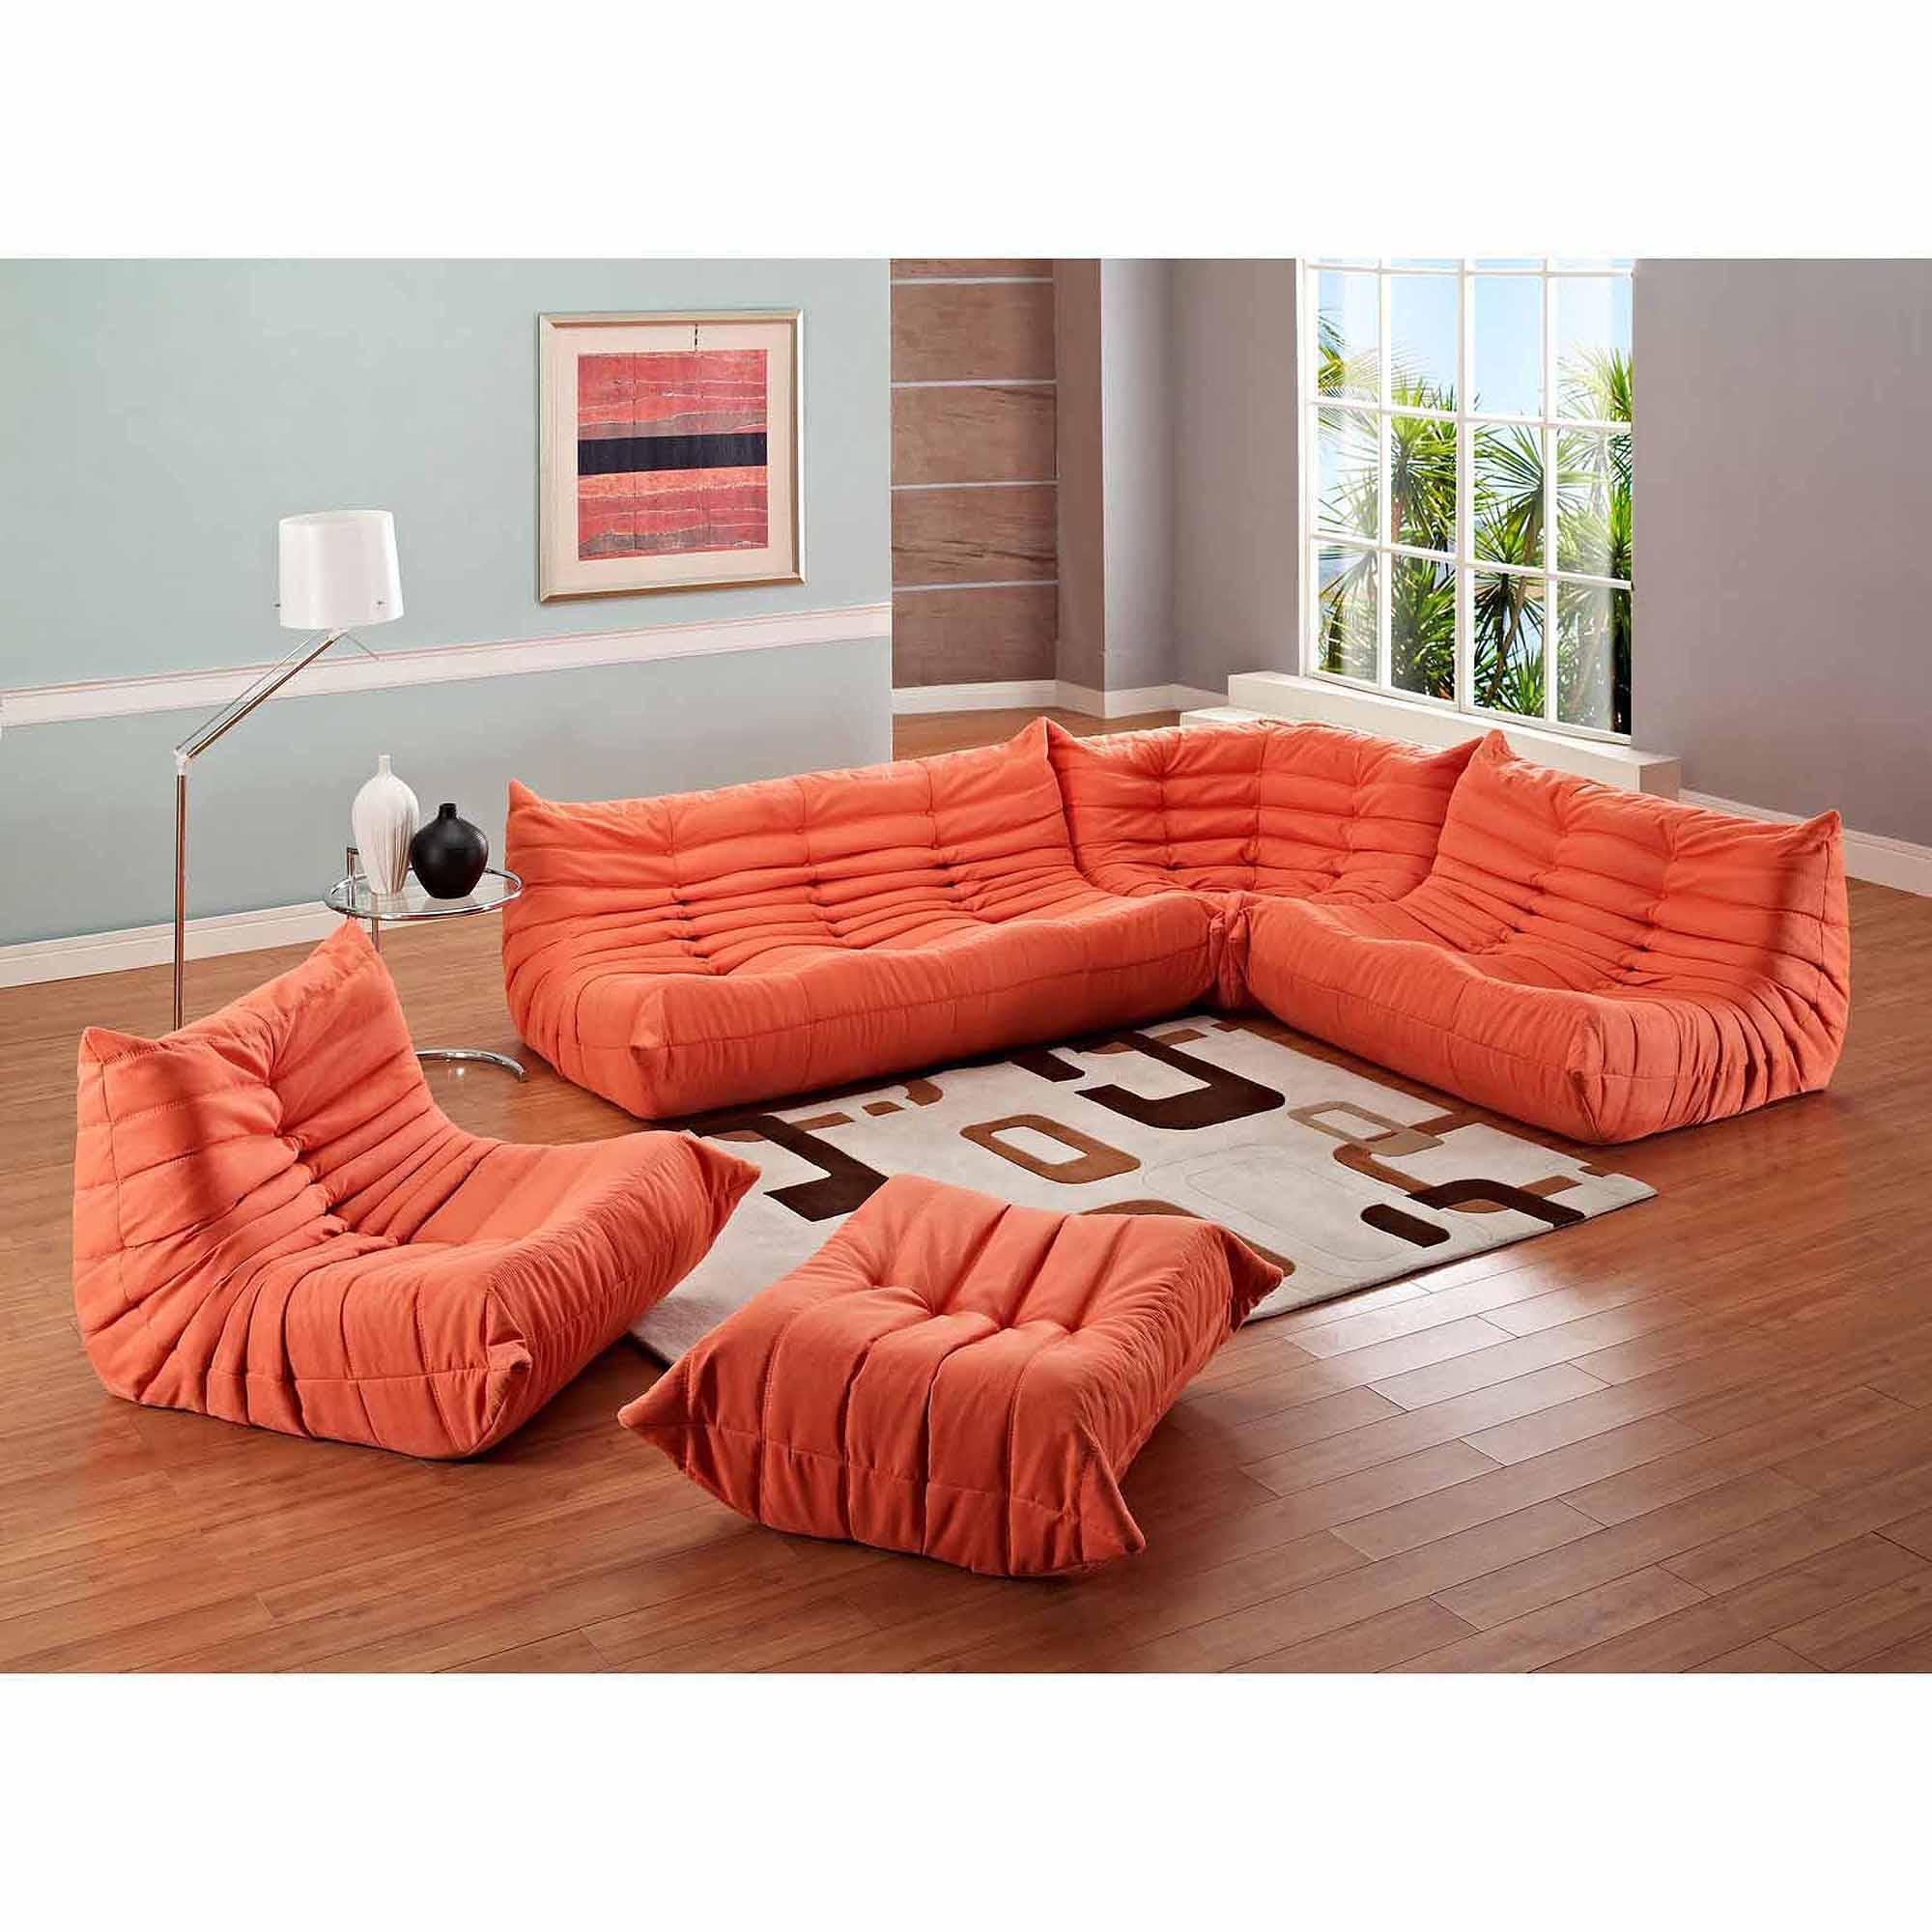 Modway Waverunner Modular Sectional Sofa Set (5 Piece) – Walmart With Orange Sectional Sofa (View 10 of 20)